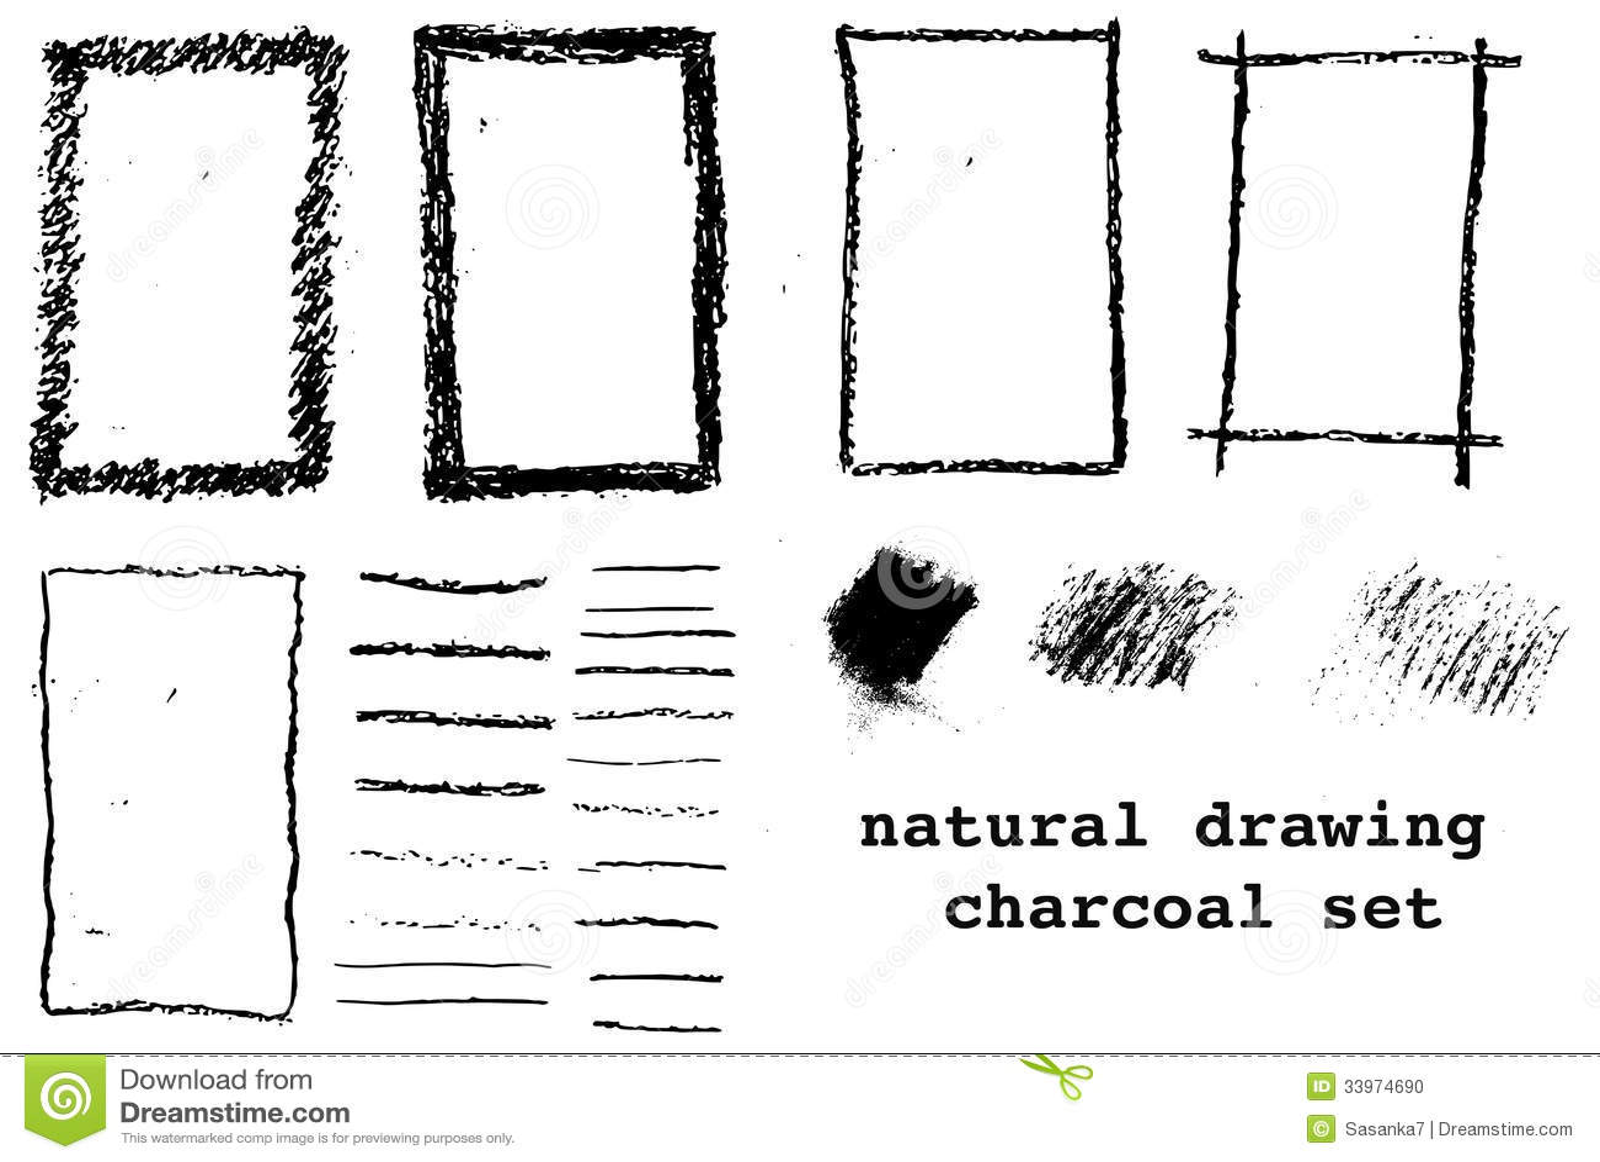 Wooden Charcoal Draw Frames Stock Illustration - Illustration of ...